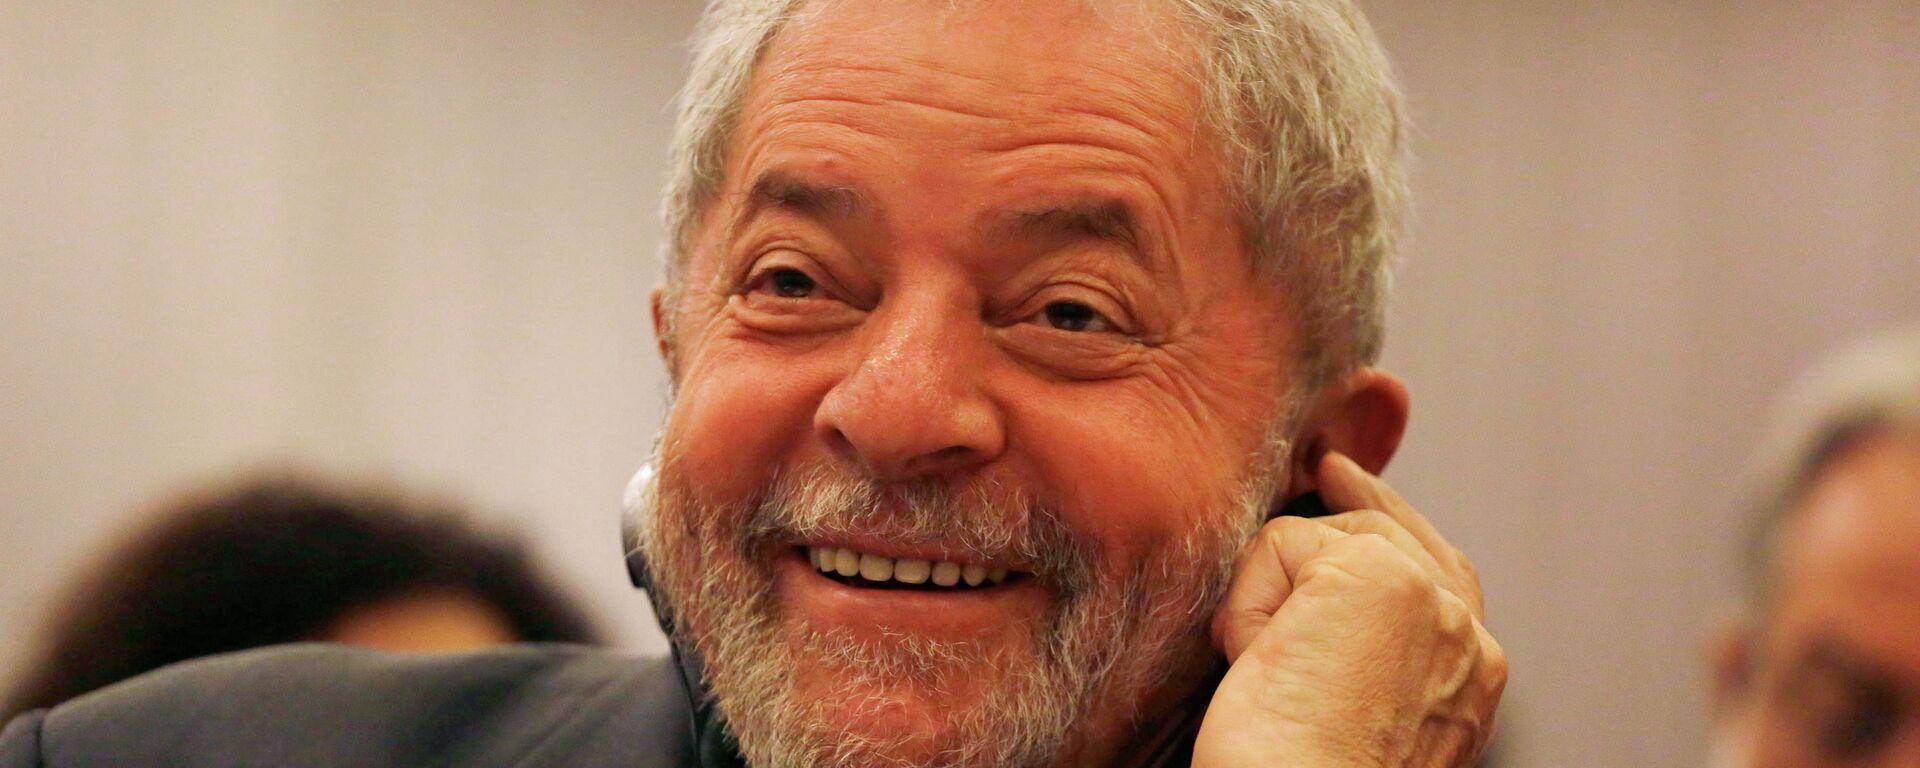 El expresidente de Brasil,  Lula da Silva - Sputnik Mundo, 1920, 09.06.2021